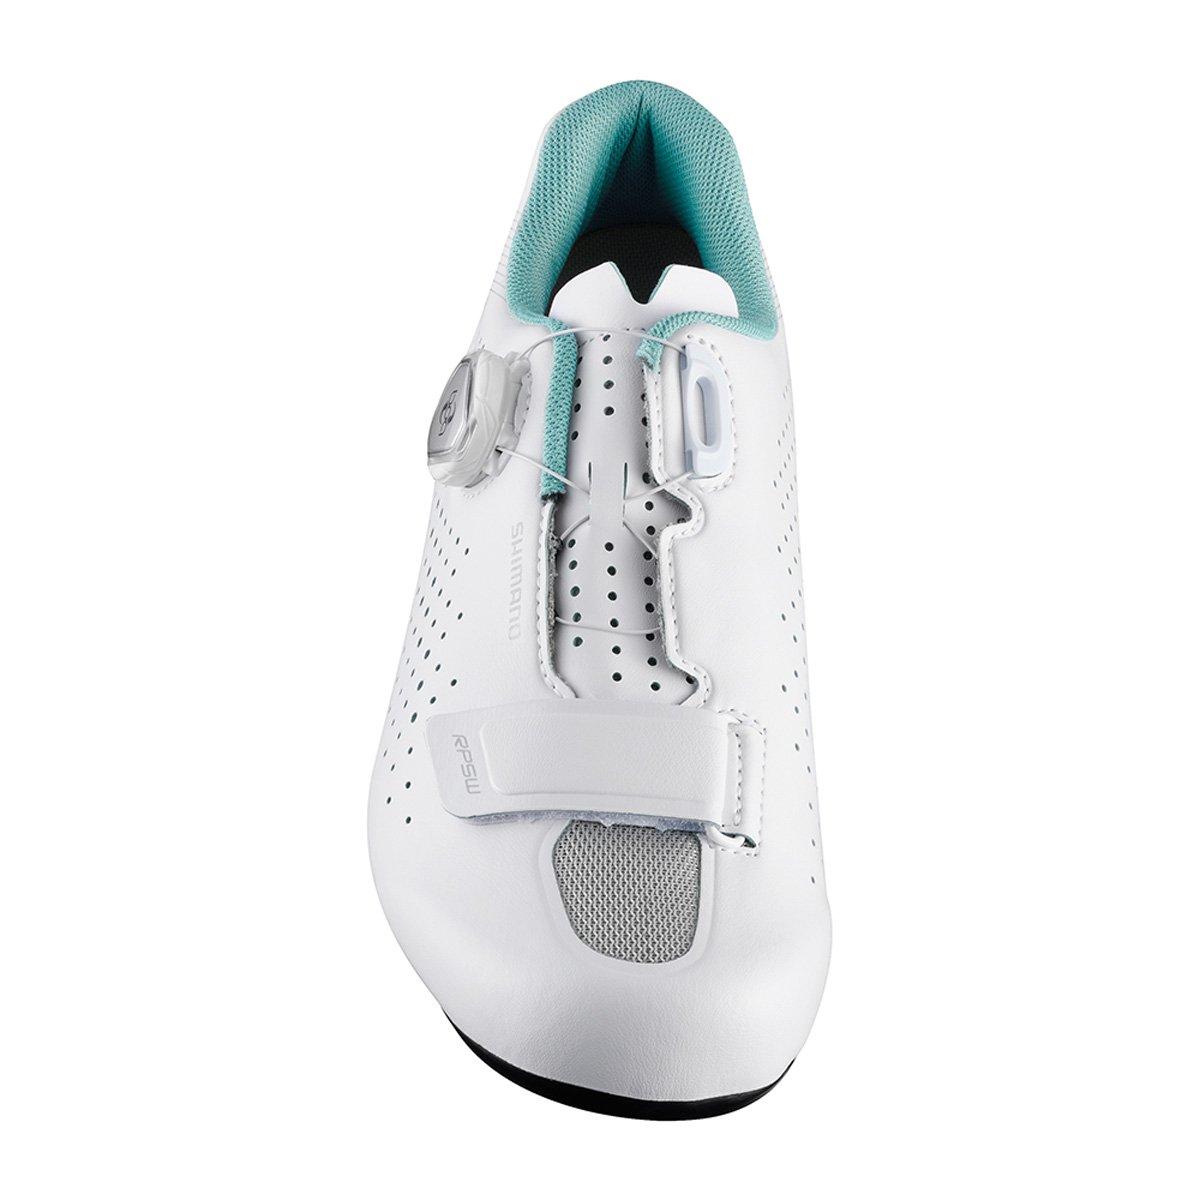 Shimano sh-rp5 Womens Boa Cycling Shoe B06XCT5C2F 38 M EU / 6.5 B(M) US|ホワイト ホワイト 38 M EU / 6.5 B(M) US